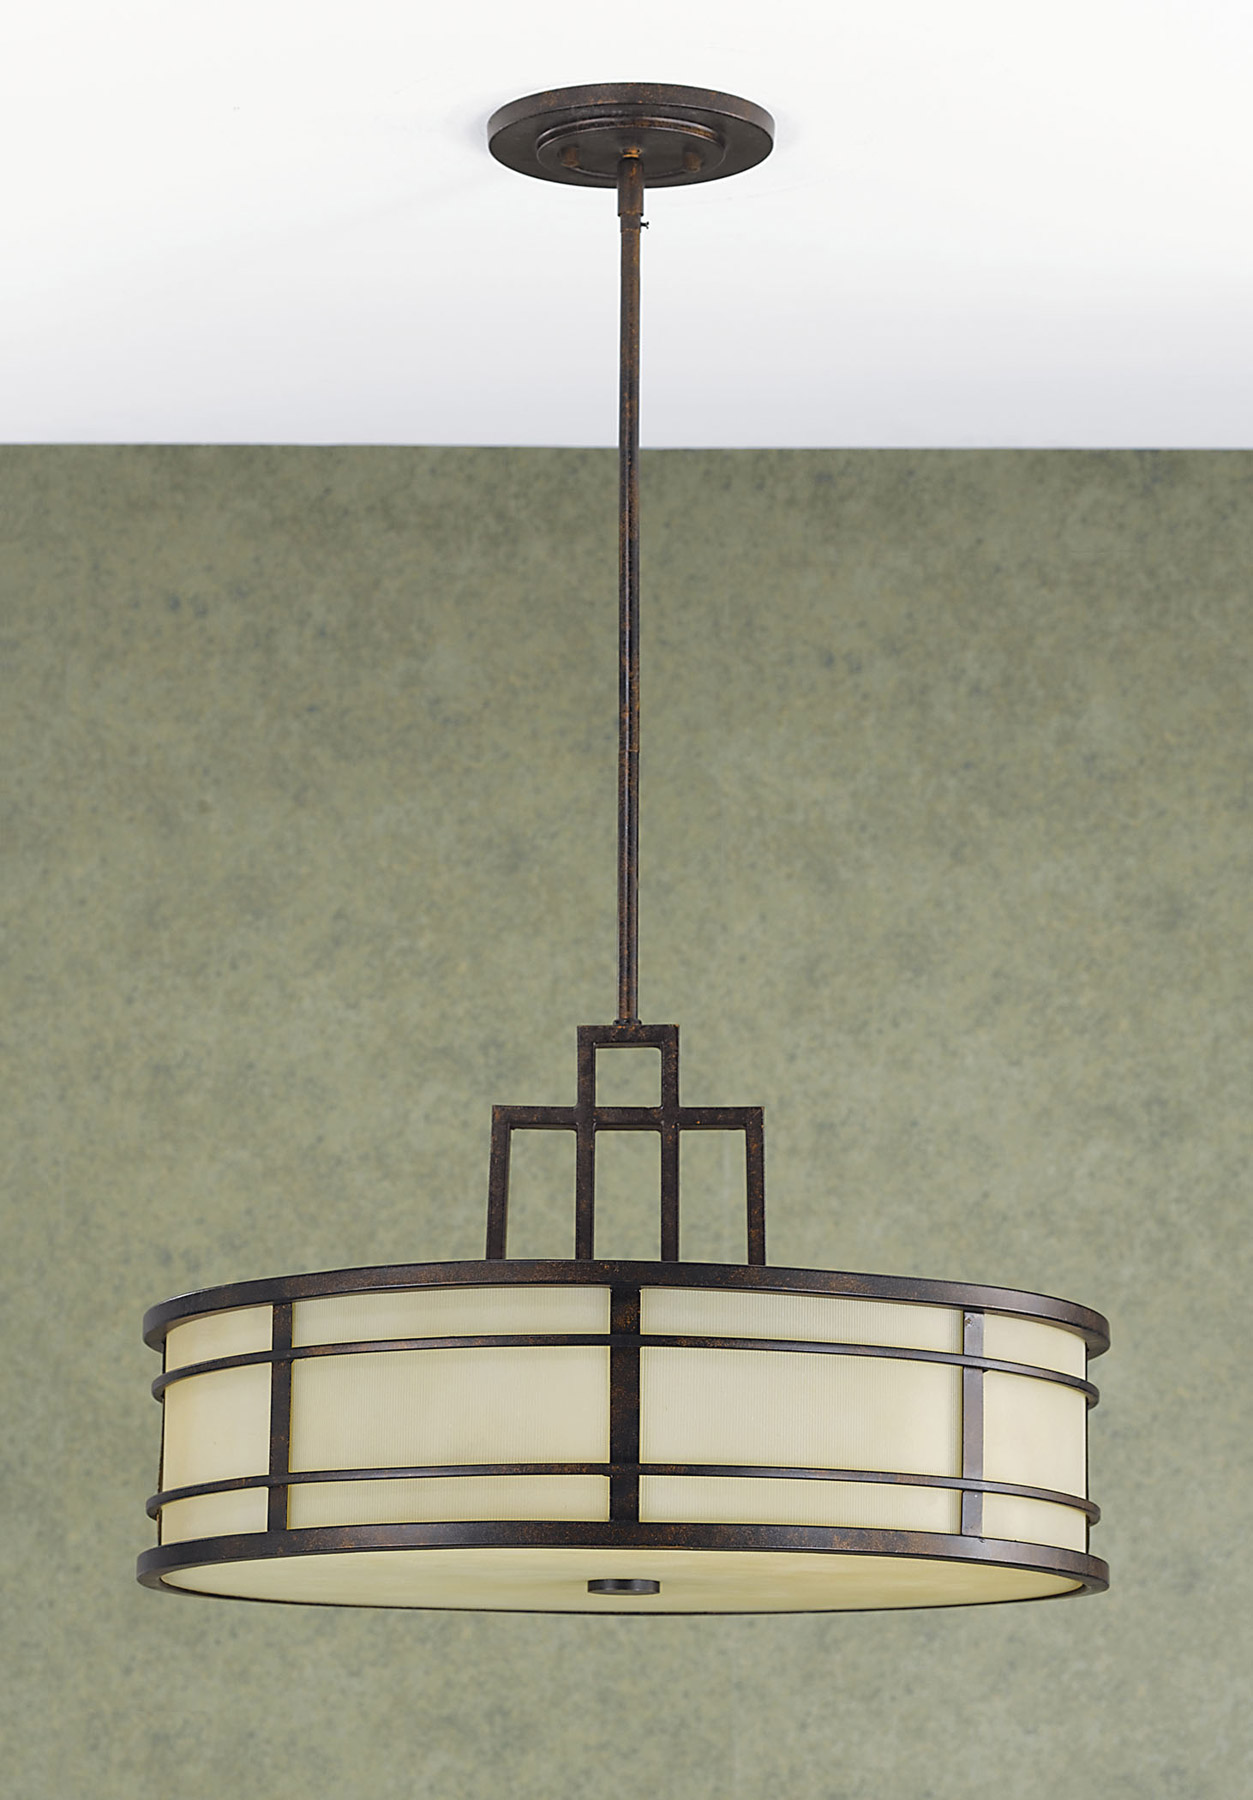 Feiss F2081/3GBZ Fusion Hanging Pendant Light